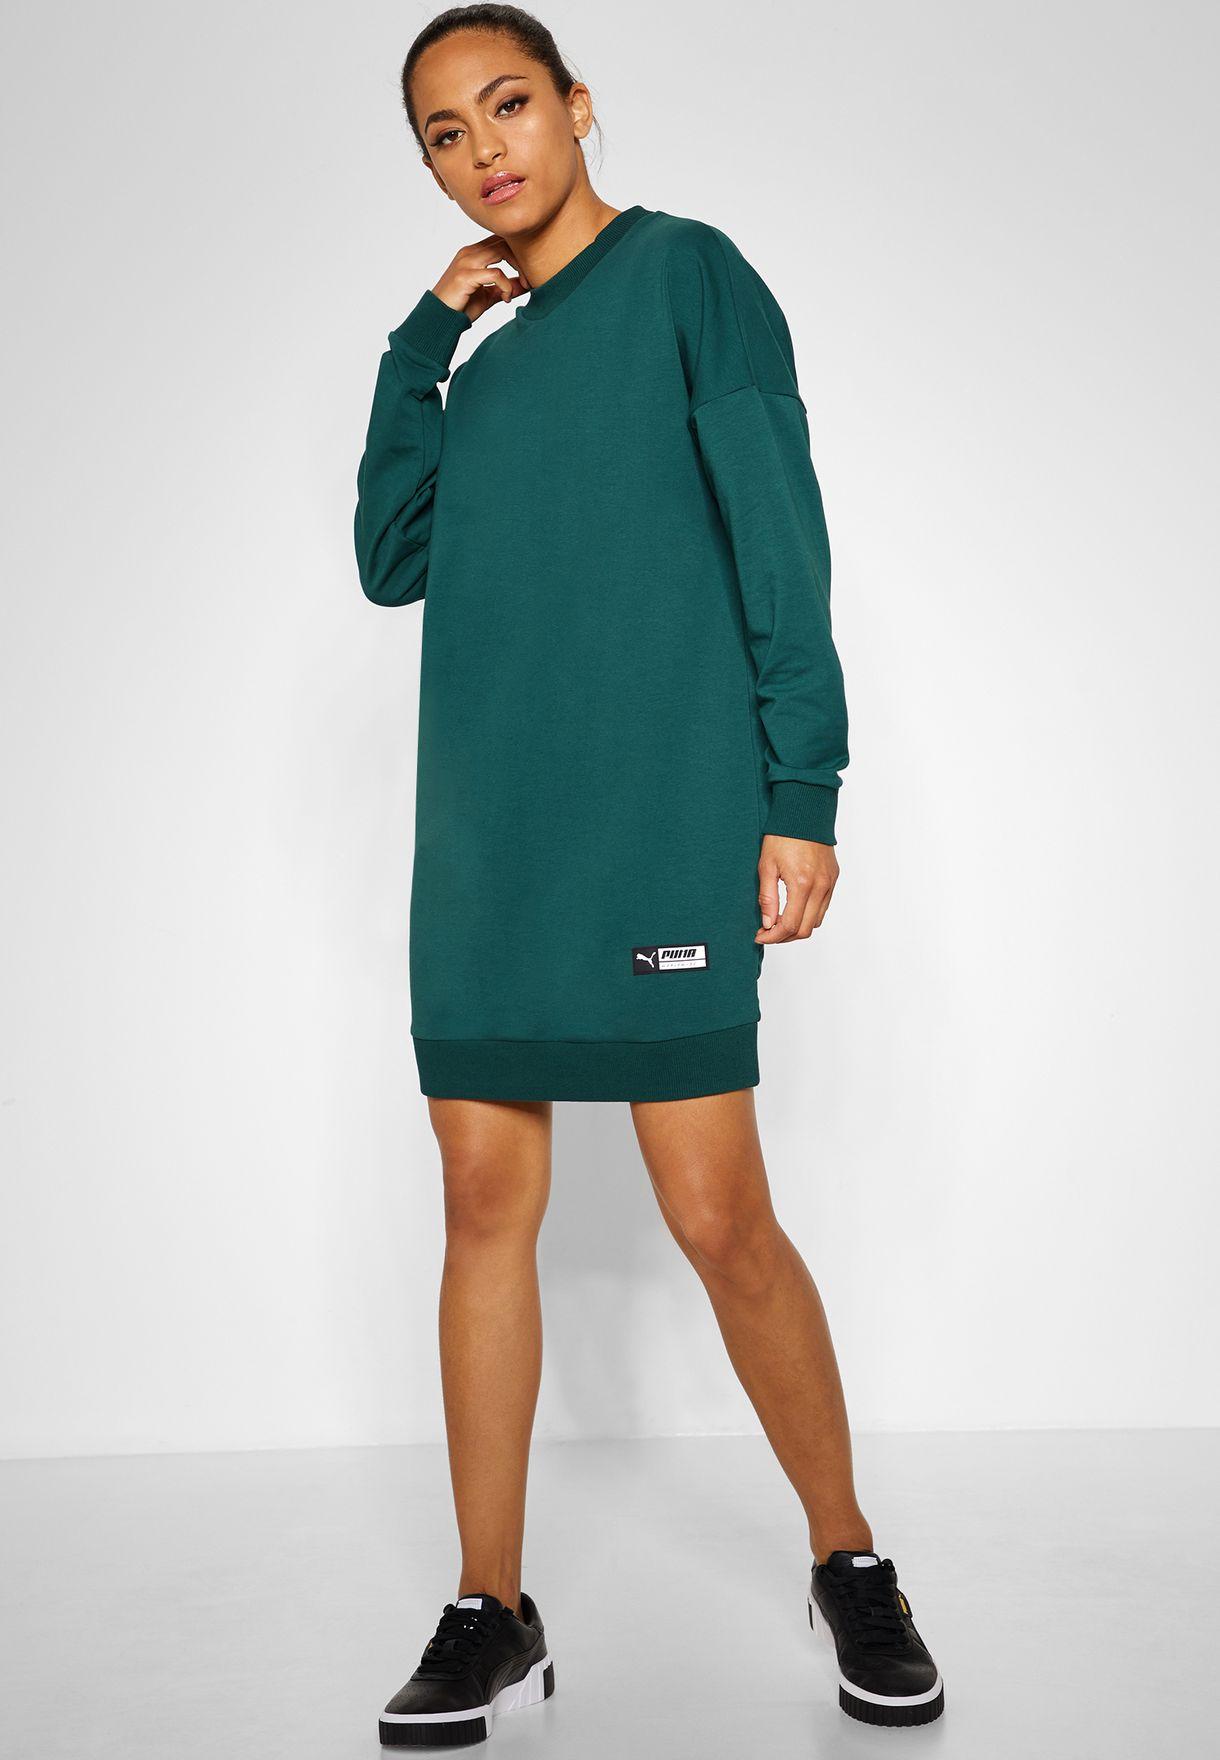 Puma Trailblazer Sweat Dress - Fashion